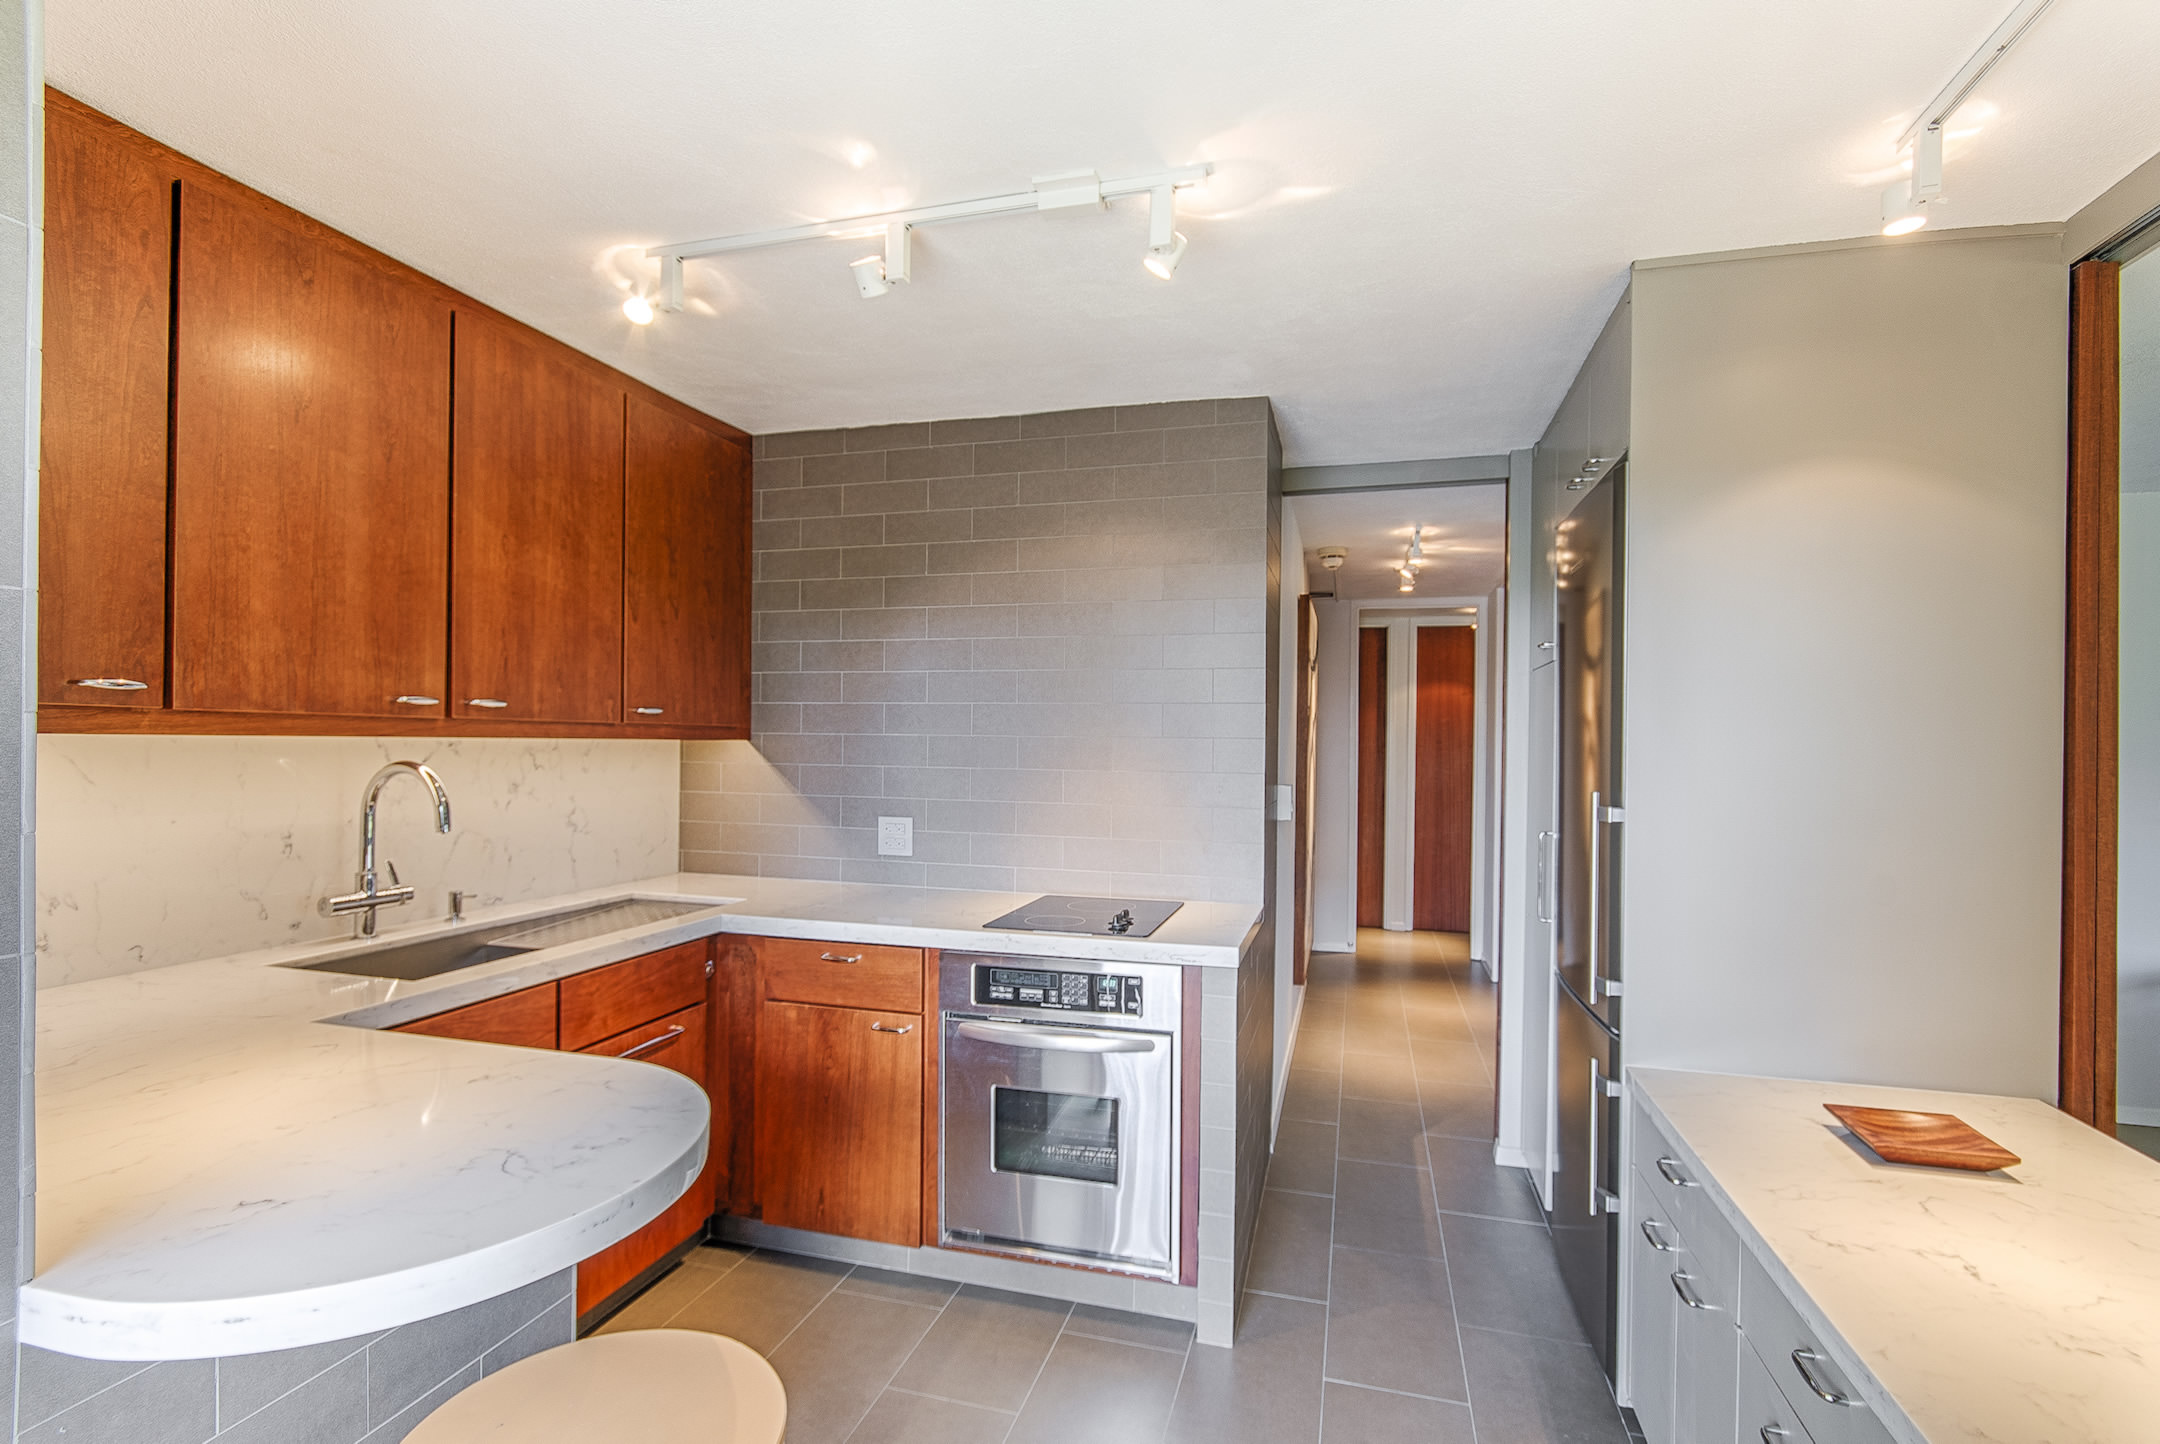 Kitchen and bathroom cabinets specially for honolulu deebonk for Bath remodel honolulu